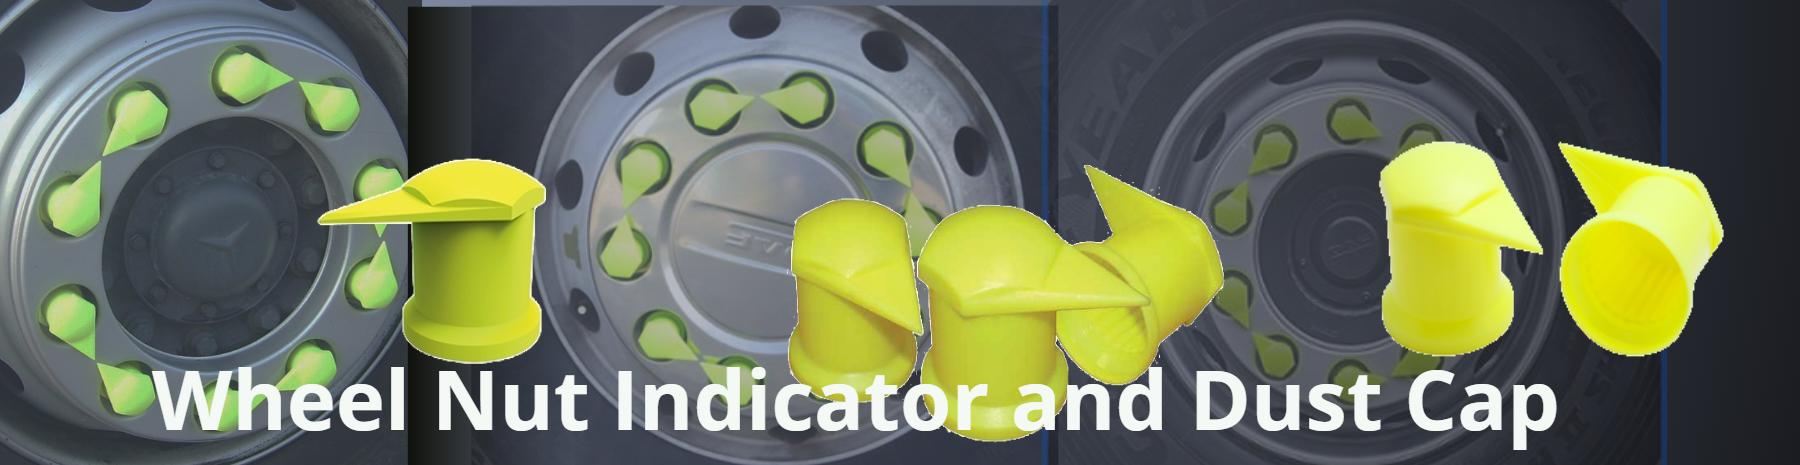 Wheel Nut Indicator and Dust Cap